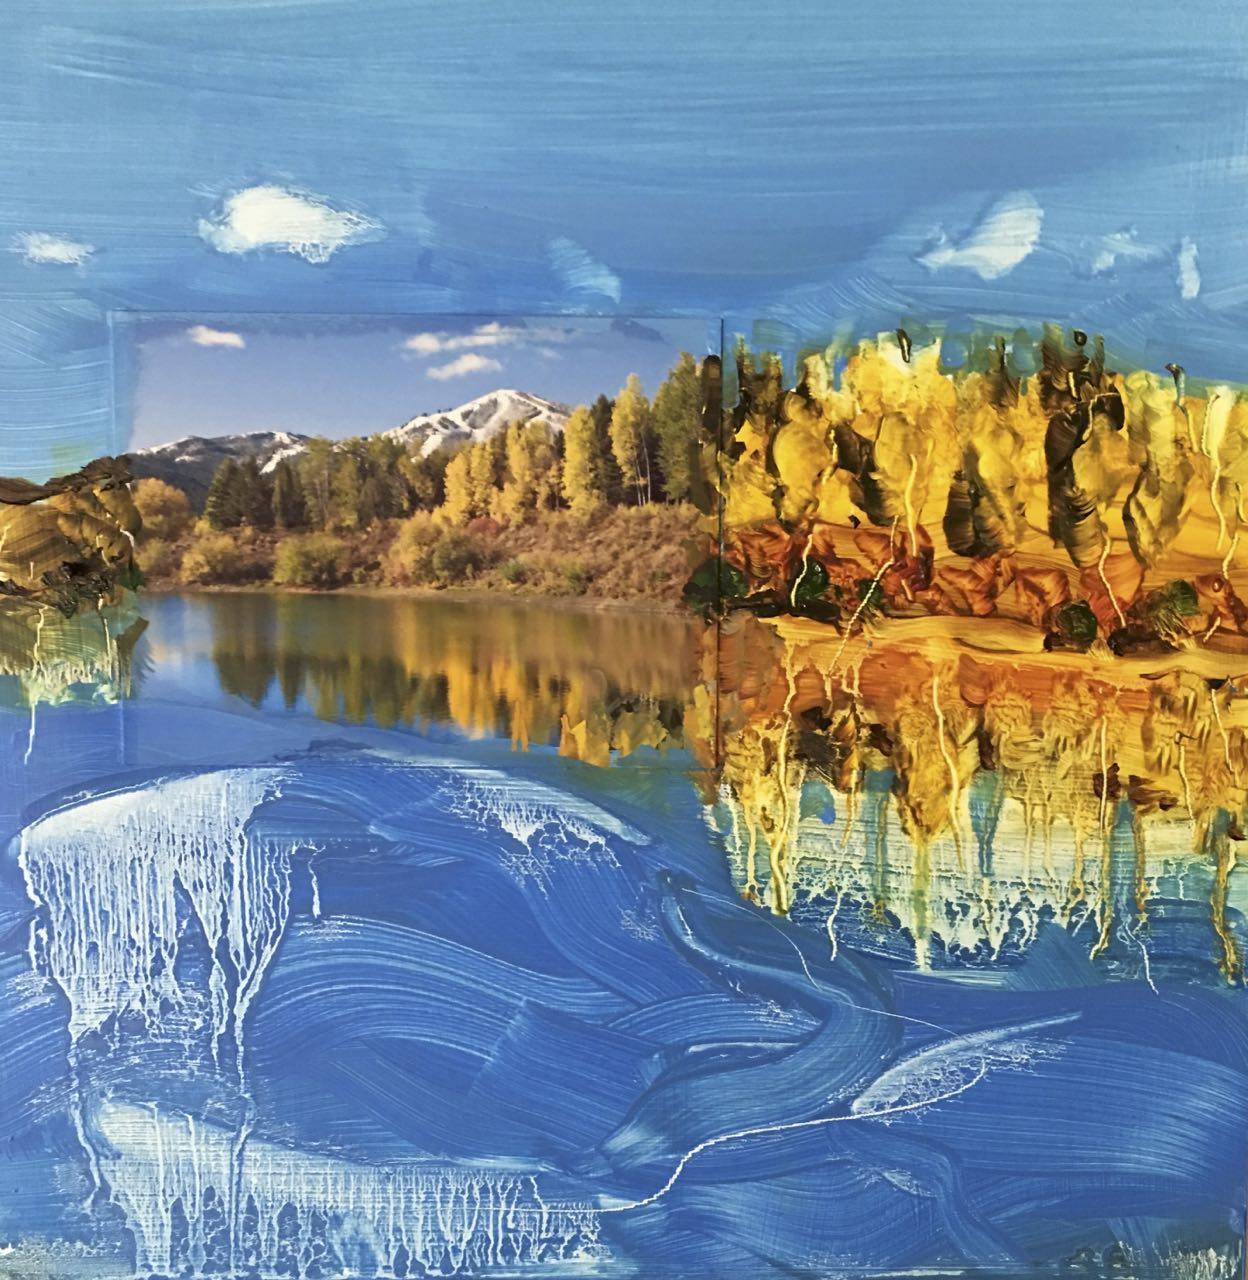 #45 Sun Valley landscape